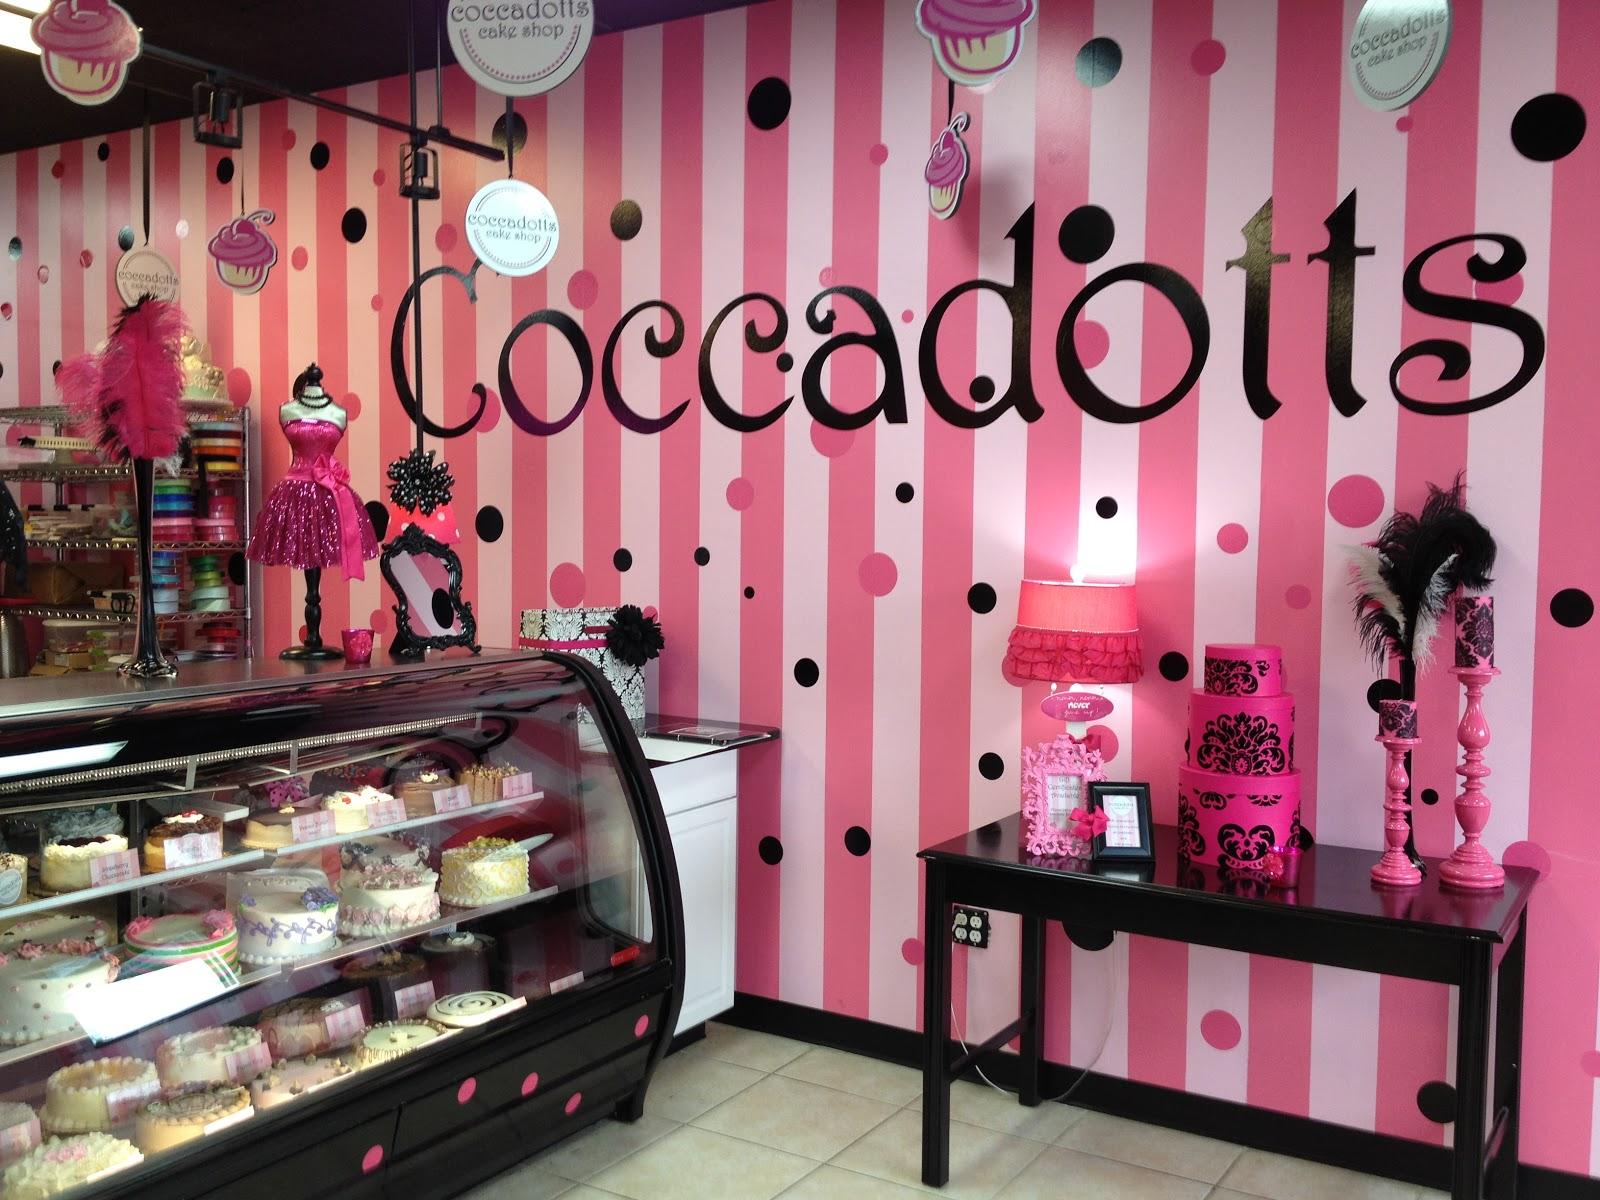 Coccadotts Cake Shop Cupcake Wars